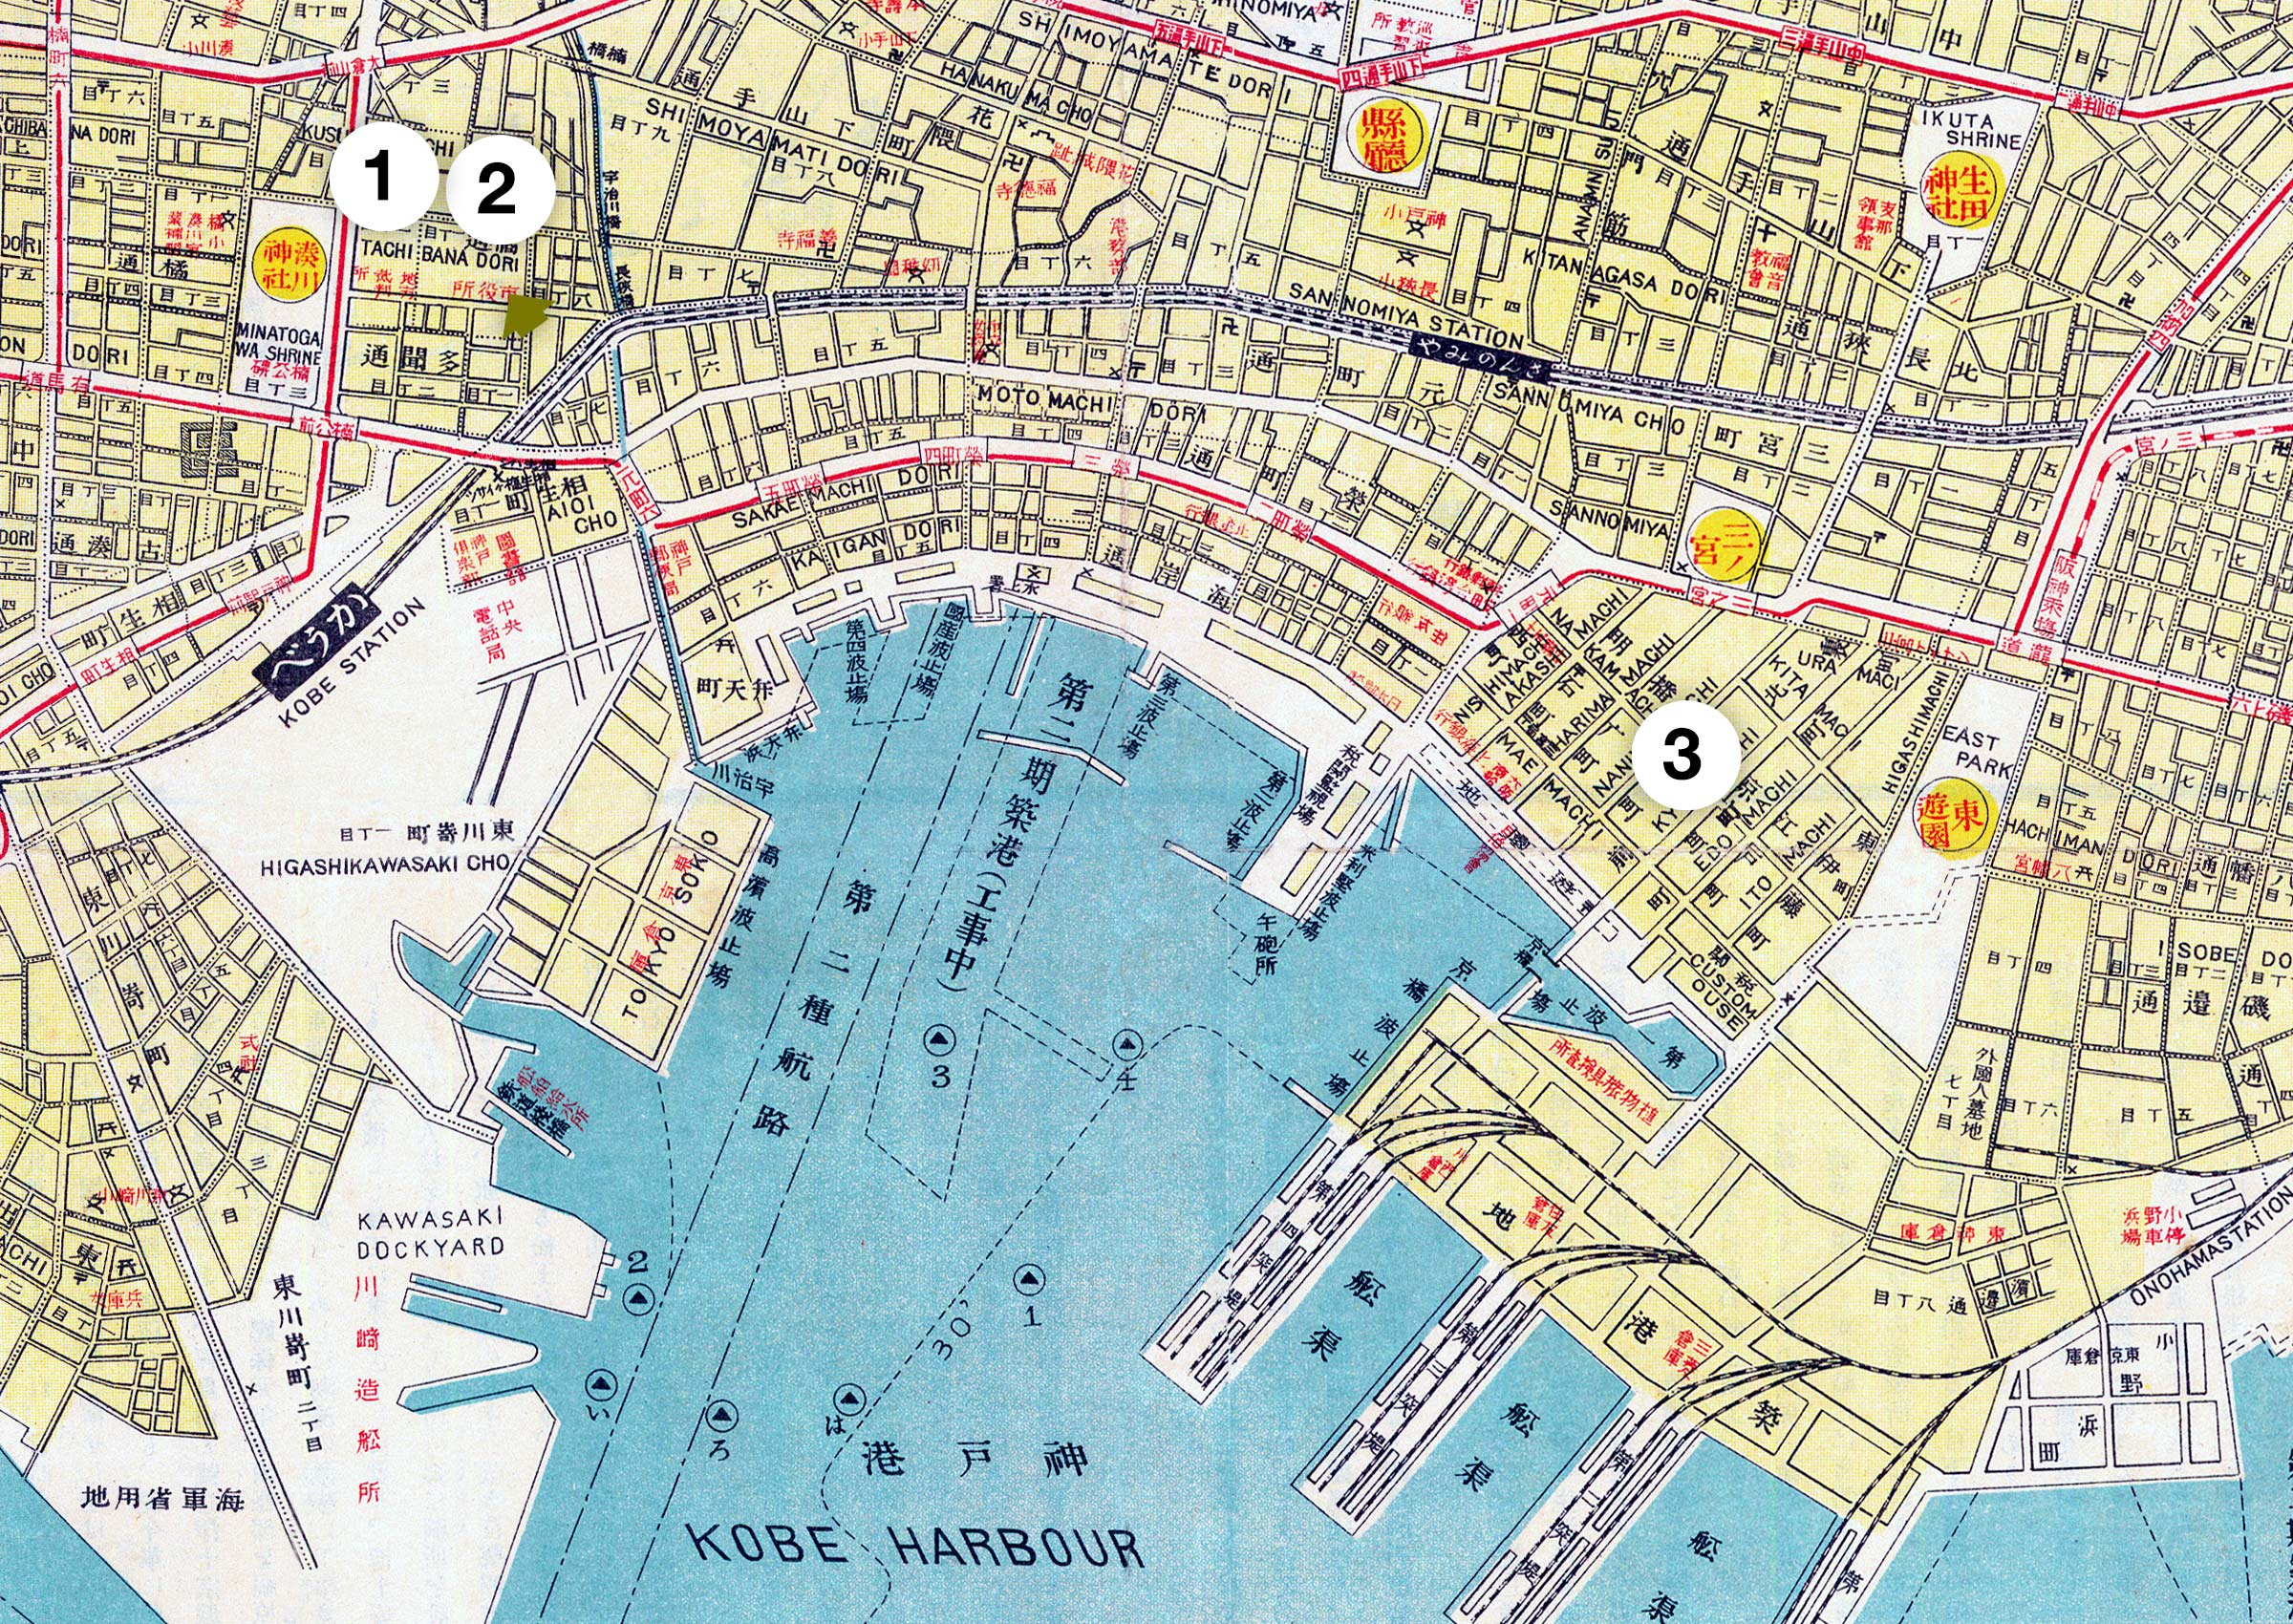 1929 Map of Kobe (70509-0003)